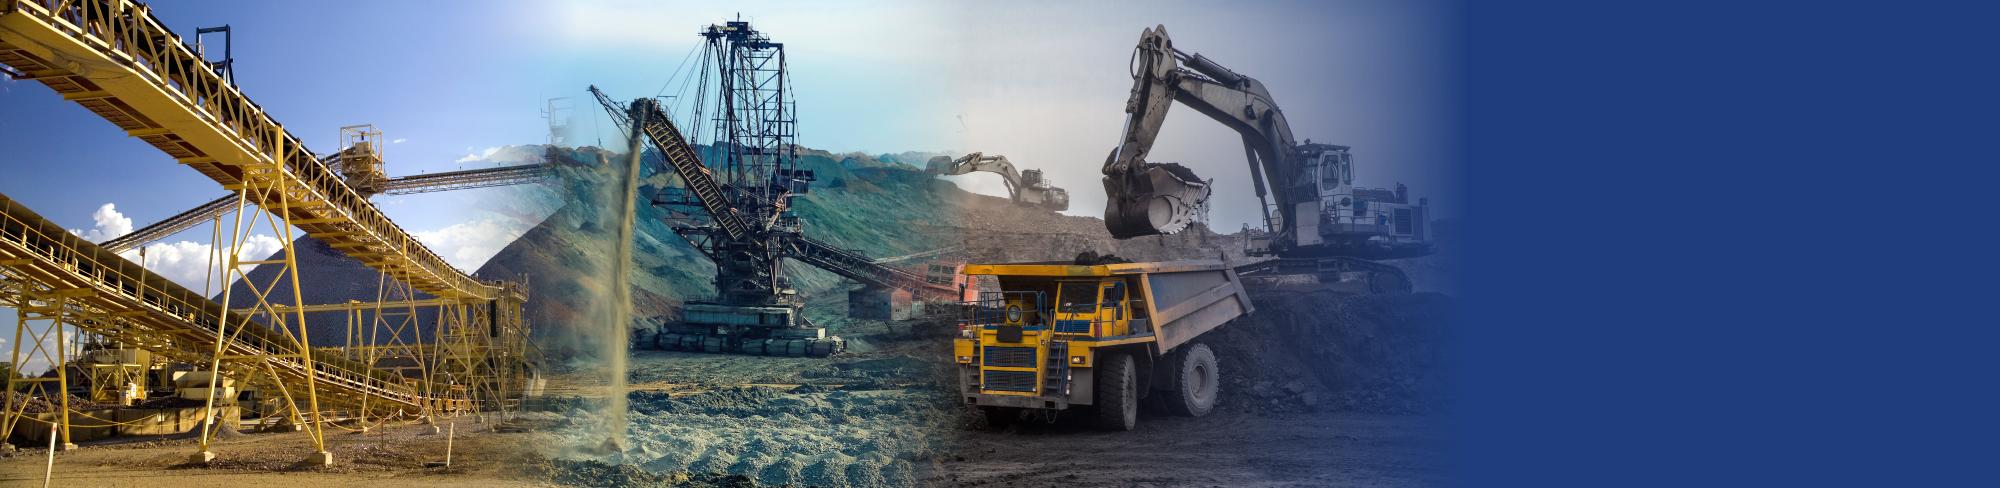 Mining. banner image